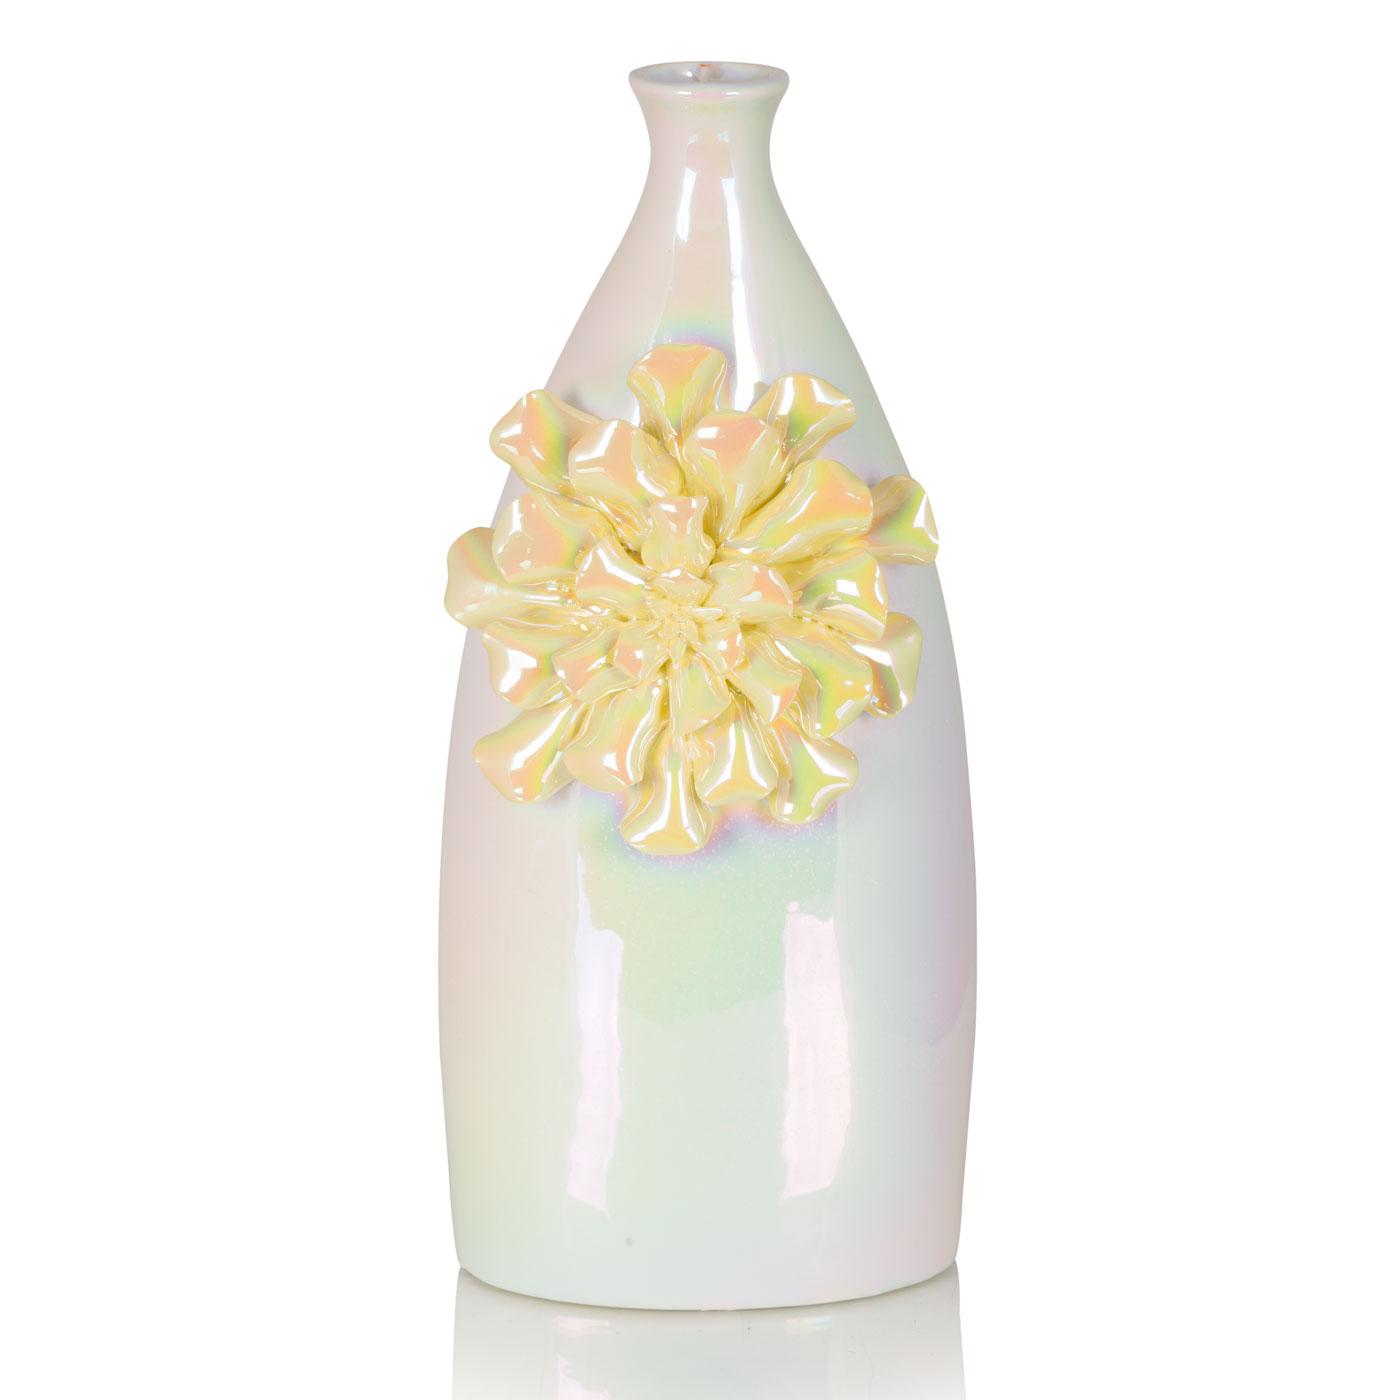 {} Home Philosophy Ваза Cindia Цвет: Перламутровый-Желтый (9х14х34 см) ваза керамическая 14 х 9 х 30 см